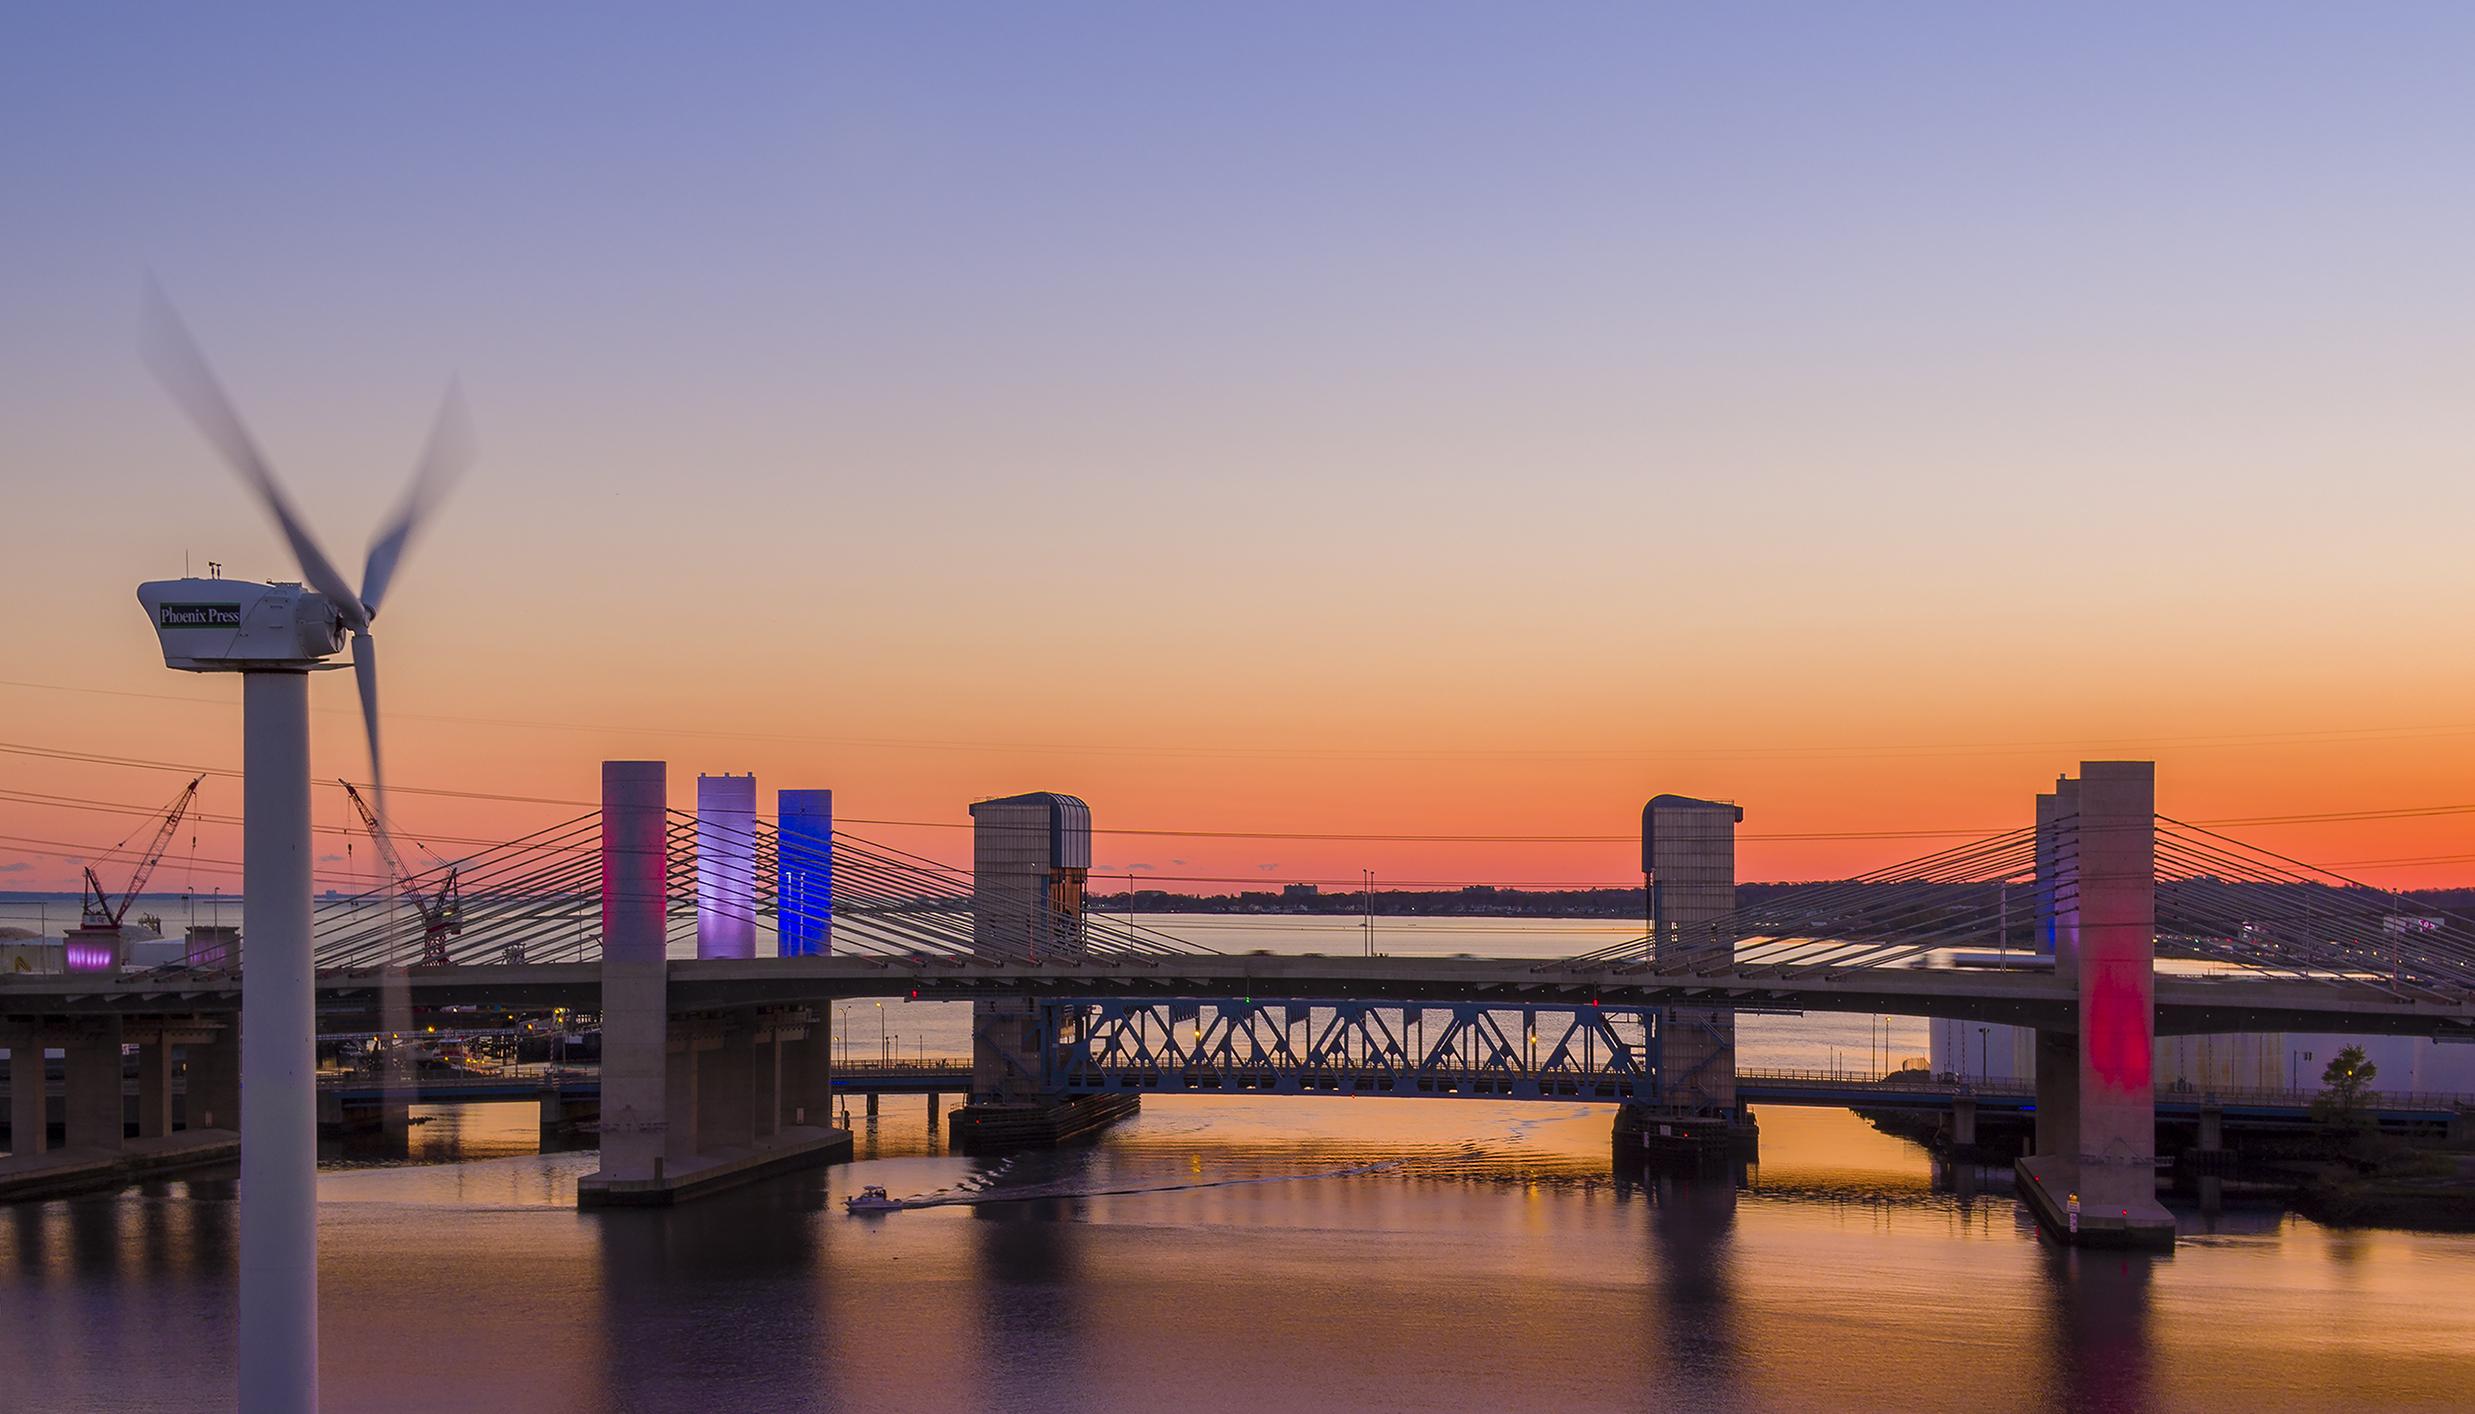 Veteran's Day drone aerial of Wind Turbine & Pearl Harbor Memorial bridge in New Haven, CT.